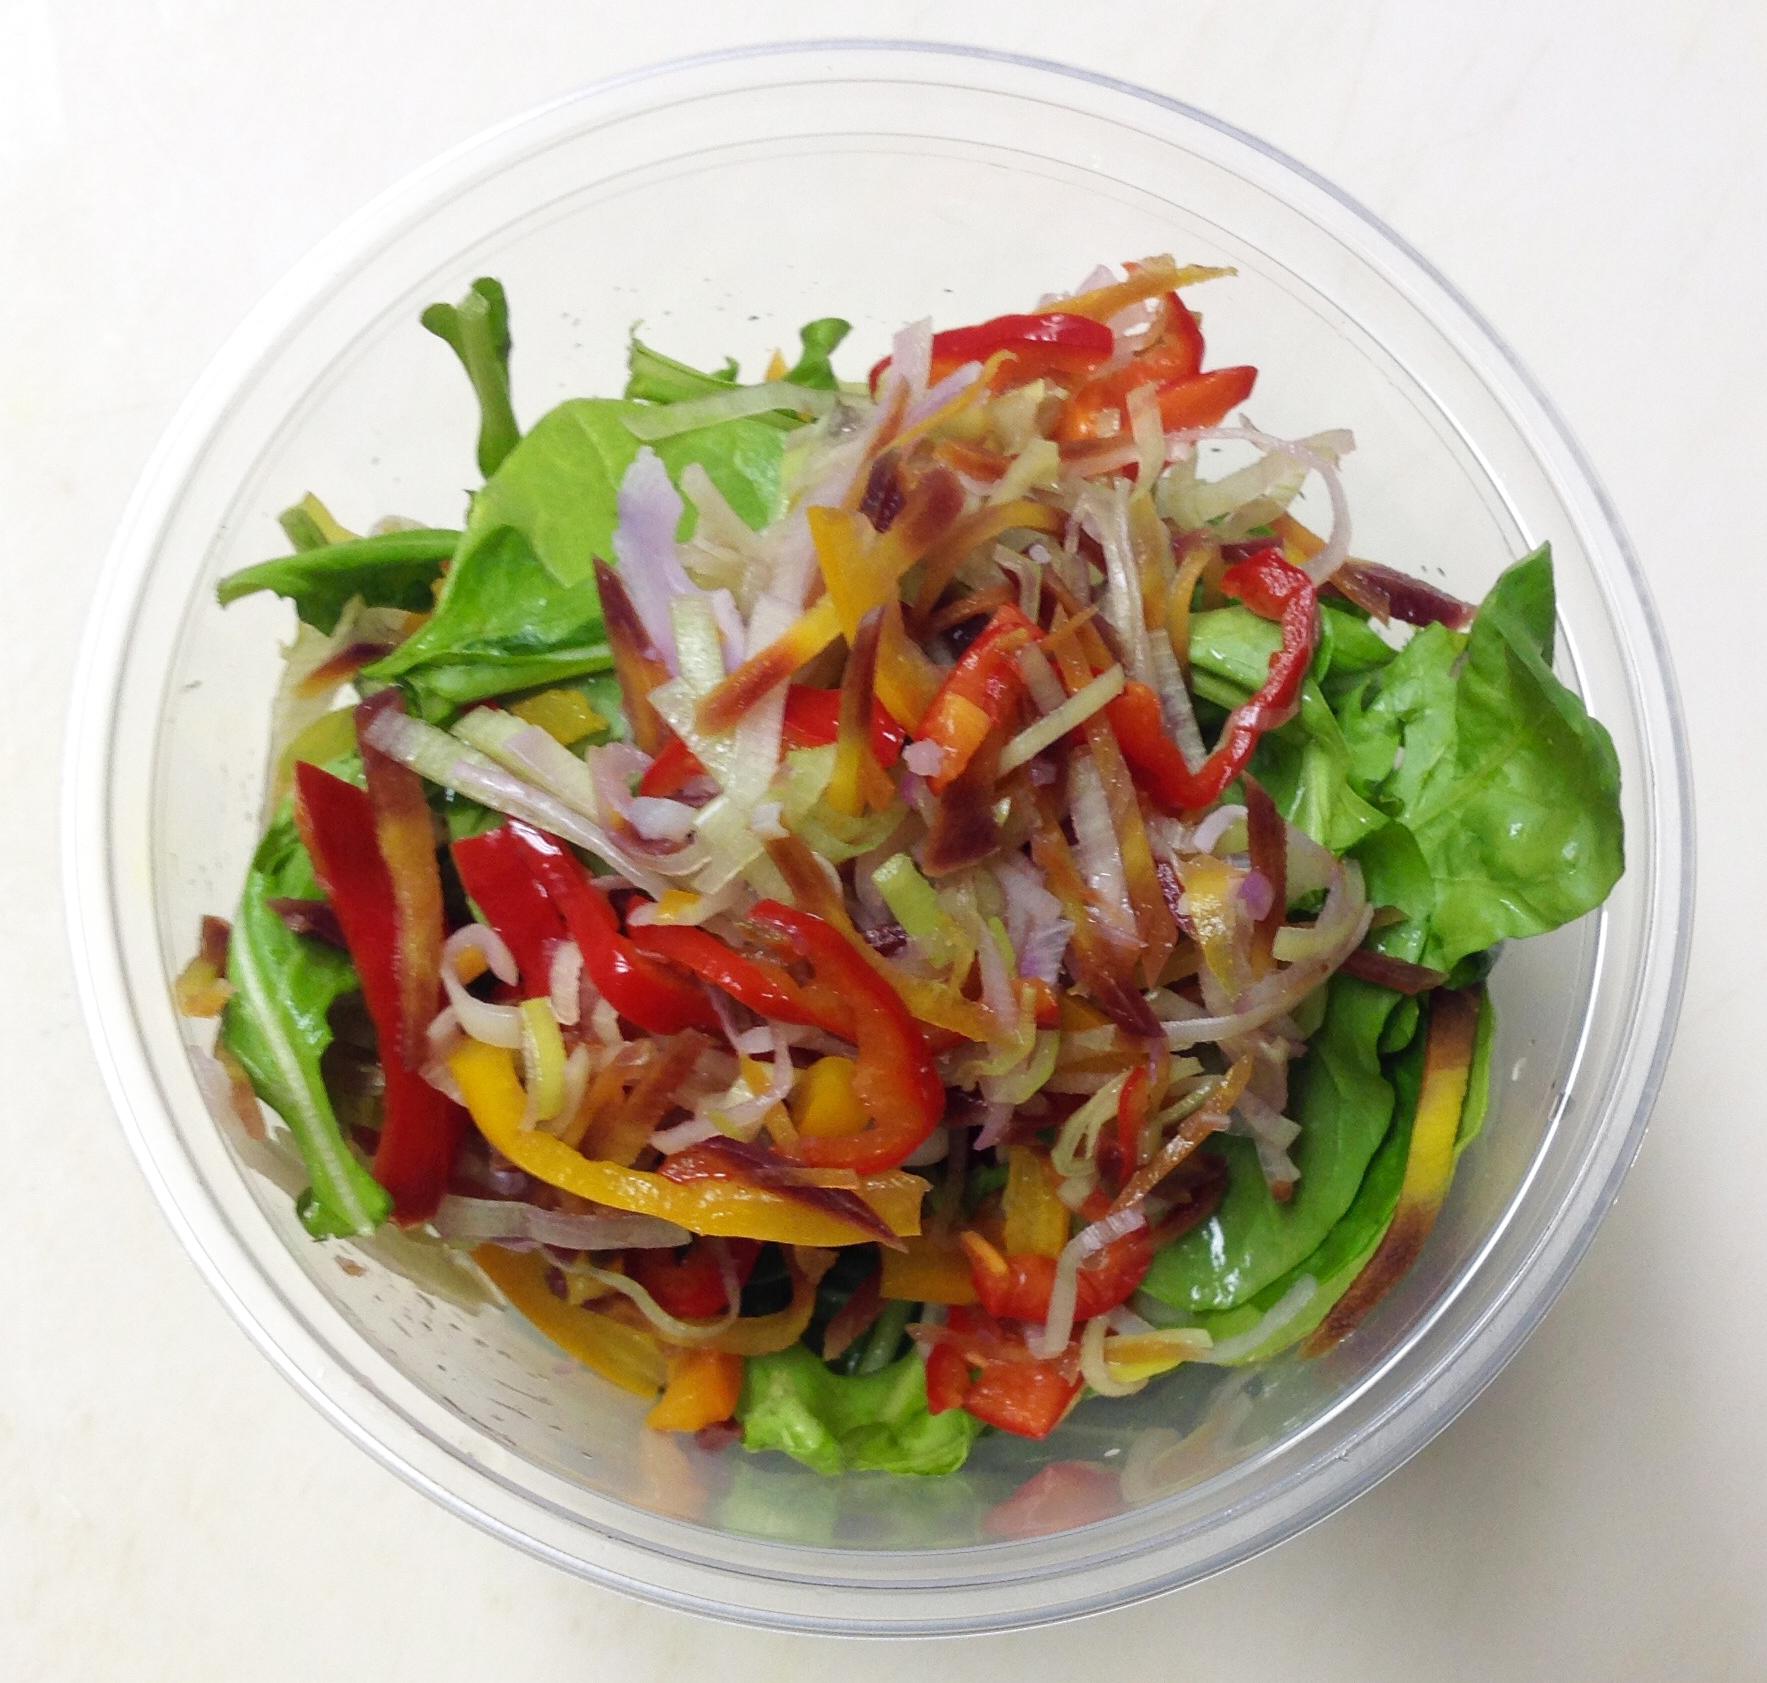 Arugula, blanched veggies